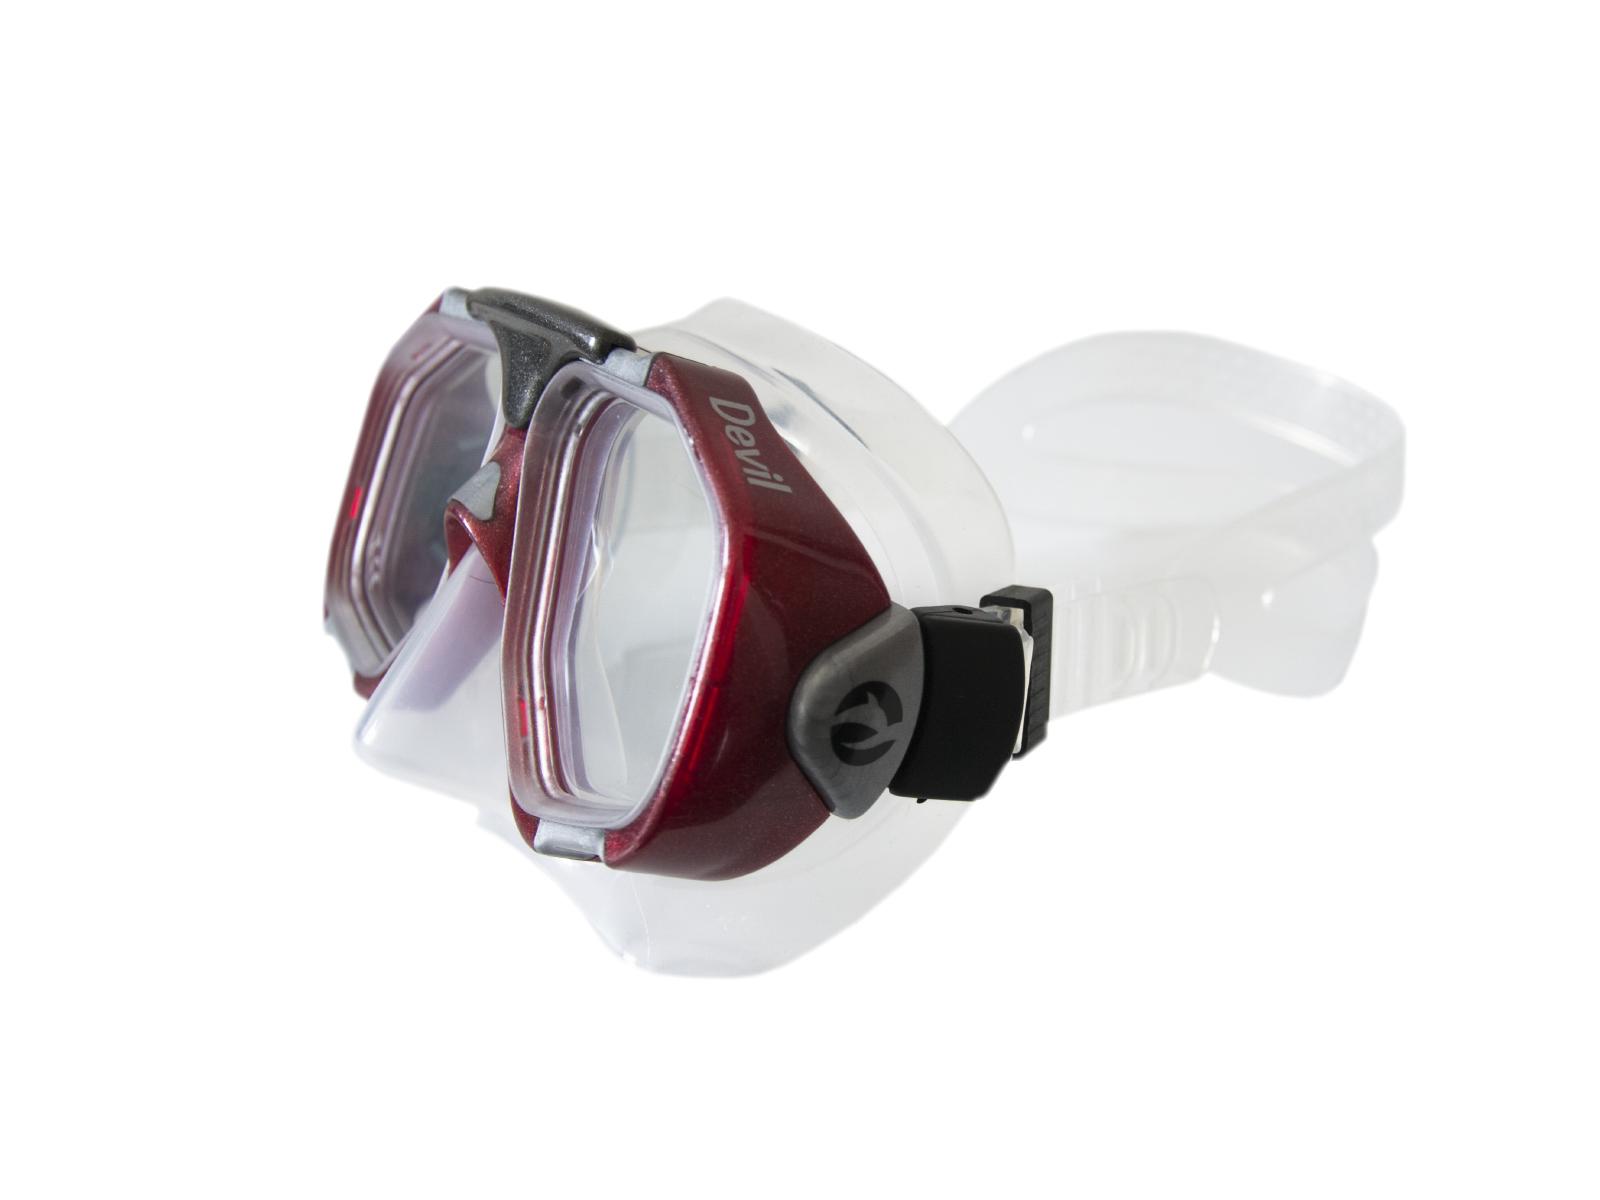 Potápačské okuliare FRANCIS Tigullio Devil senior